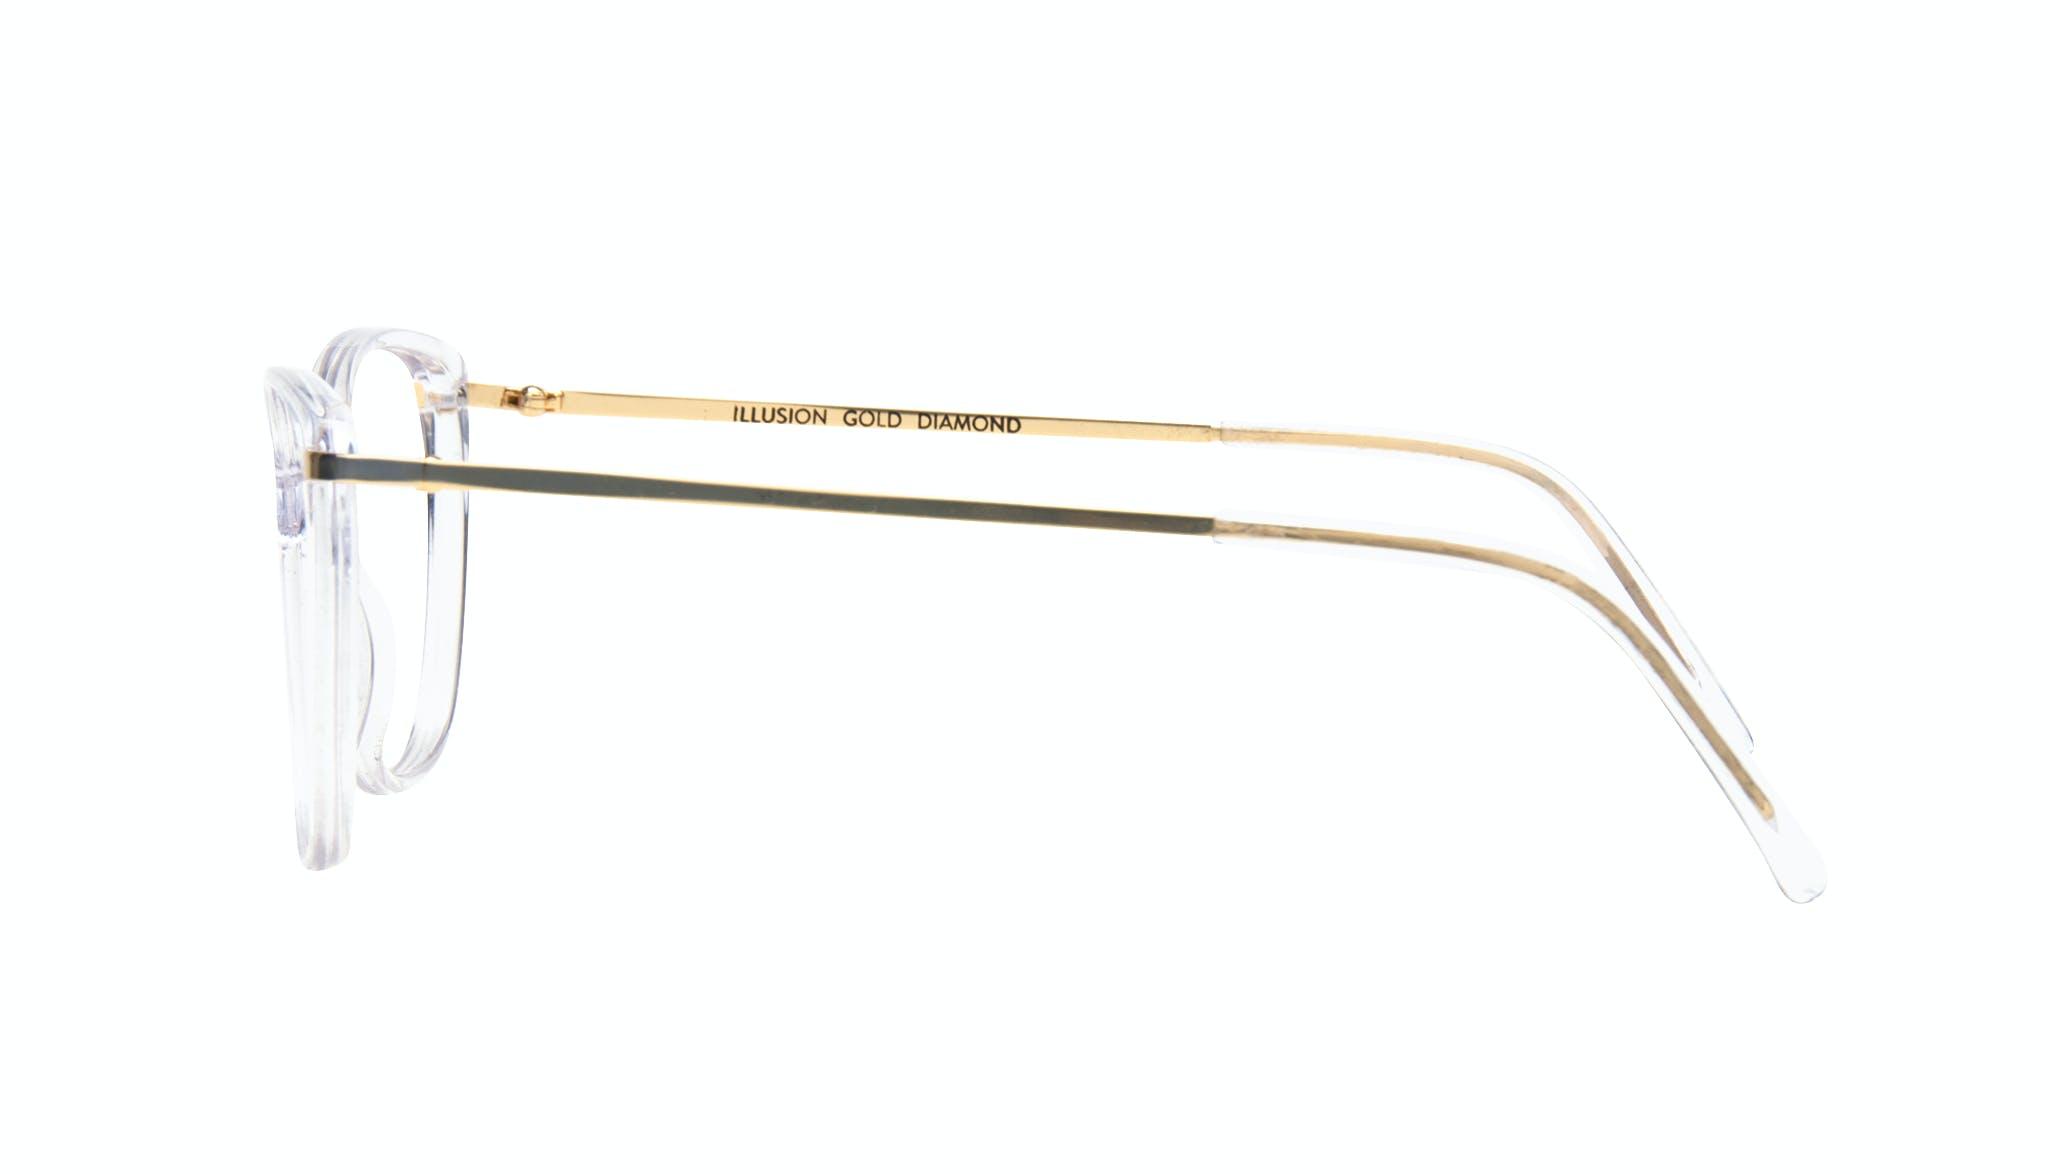 Affordable Fashion Glasses Cat Eye Rectangle Square Eyeglasses Women Illusion Gold Diamond Side